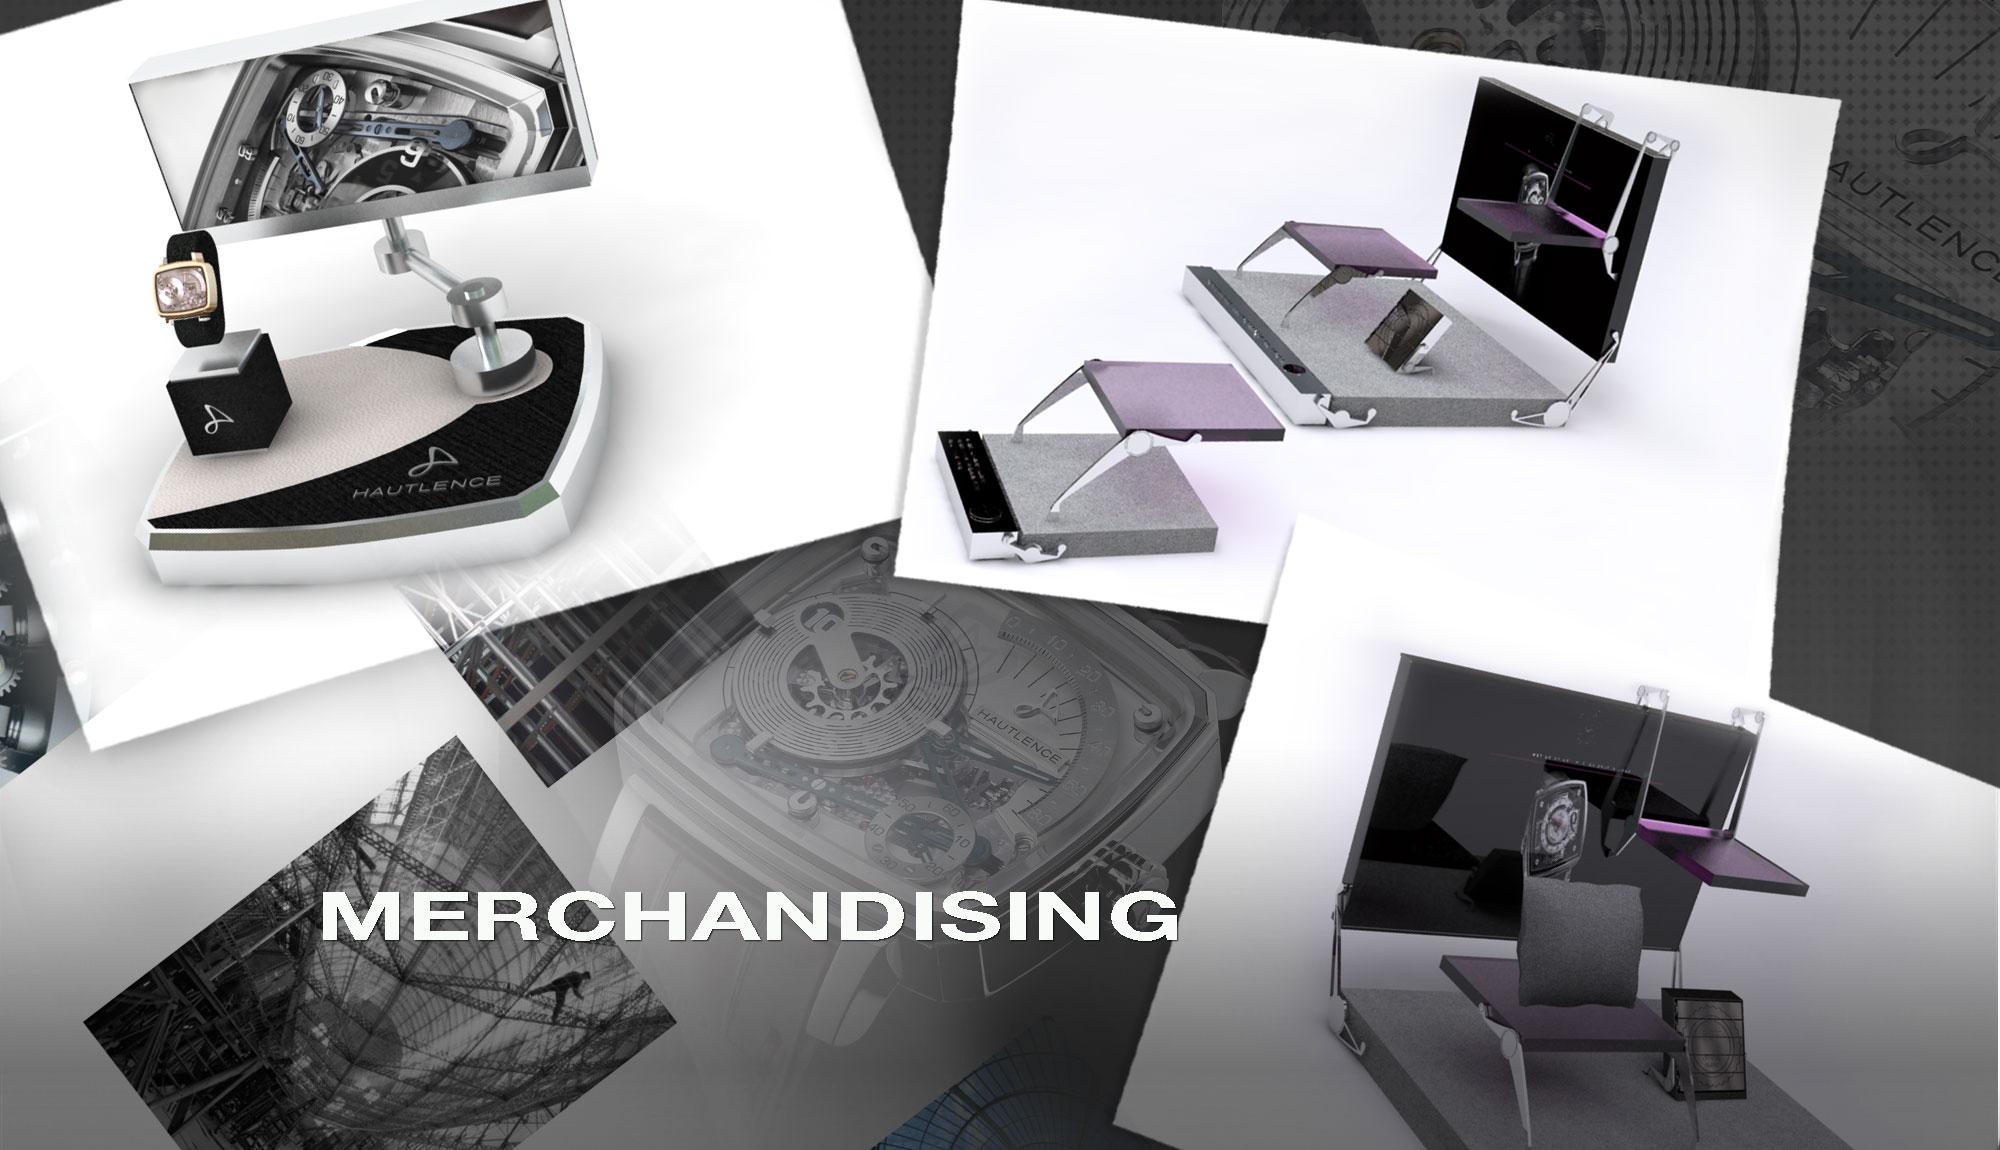 DESGIN ETC. - MERCHANDISING